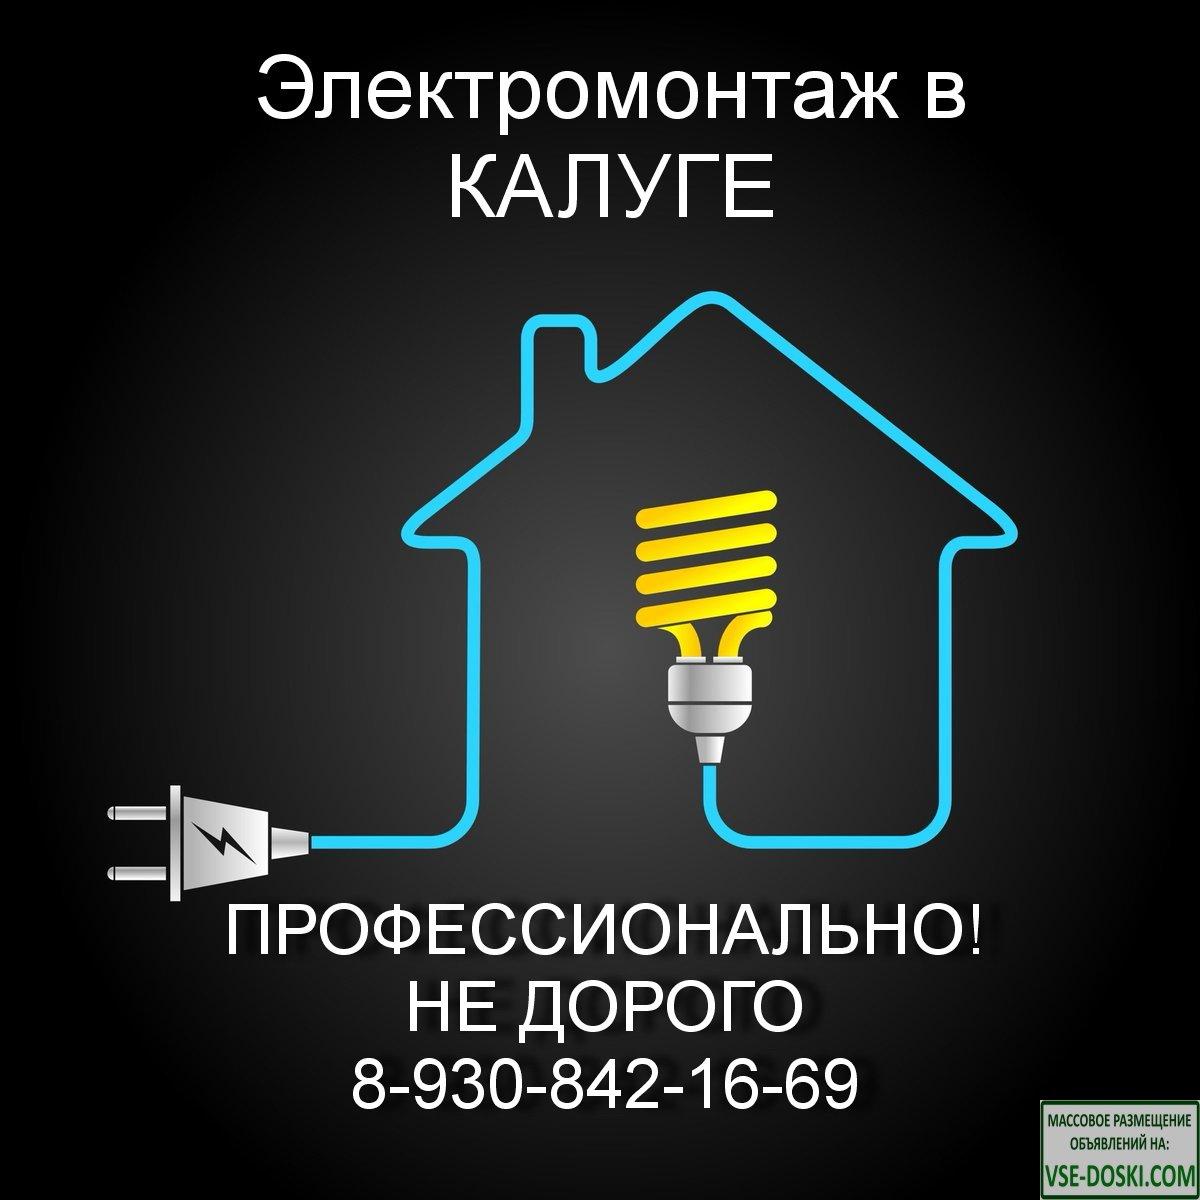 Электрик-инженер / Электромонтаж профессиональный